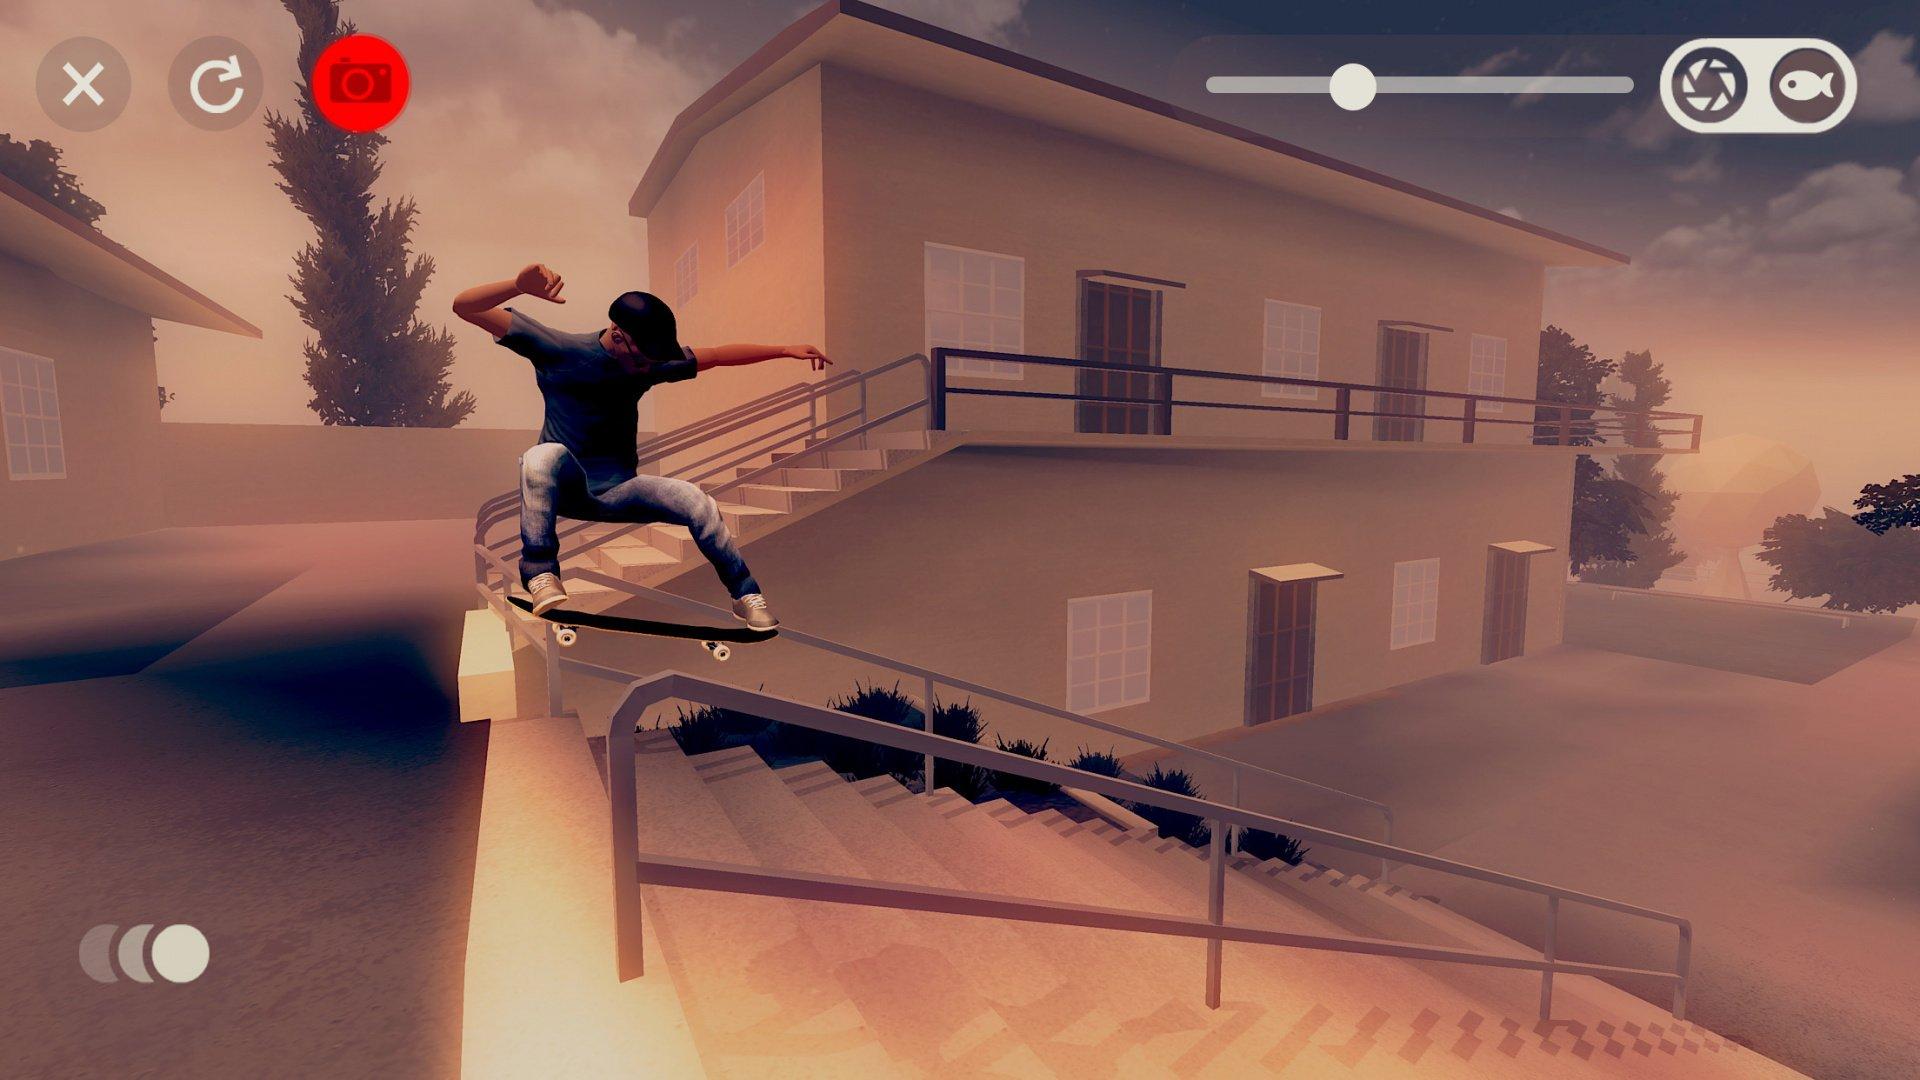 skate city game trick wallpaper 74326